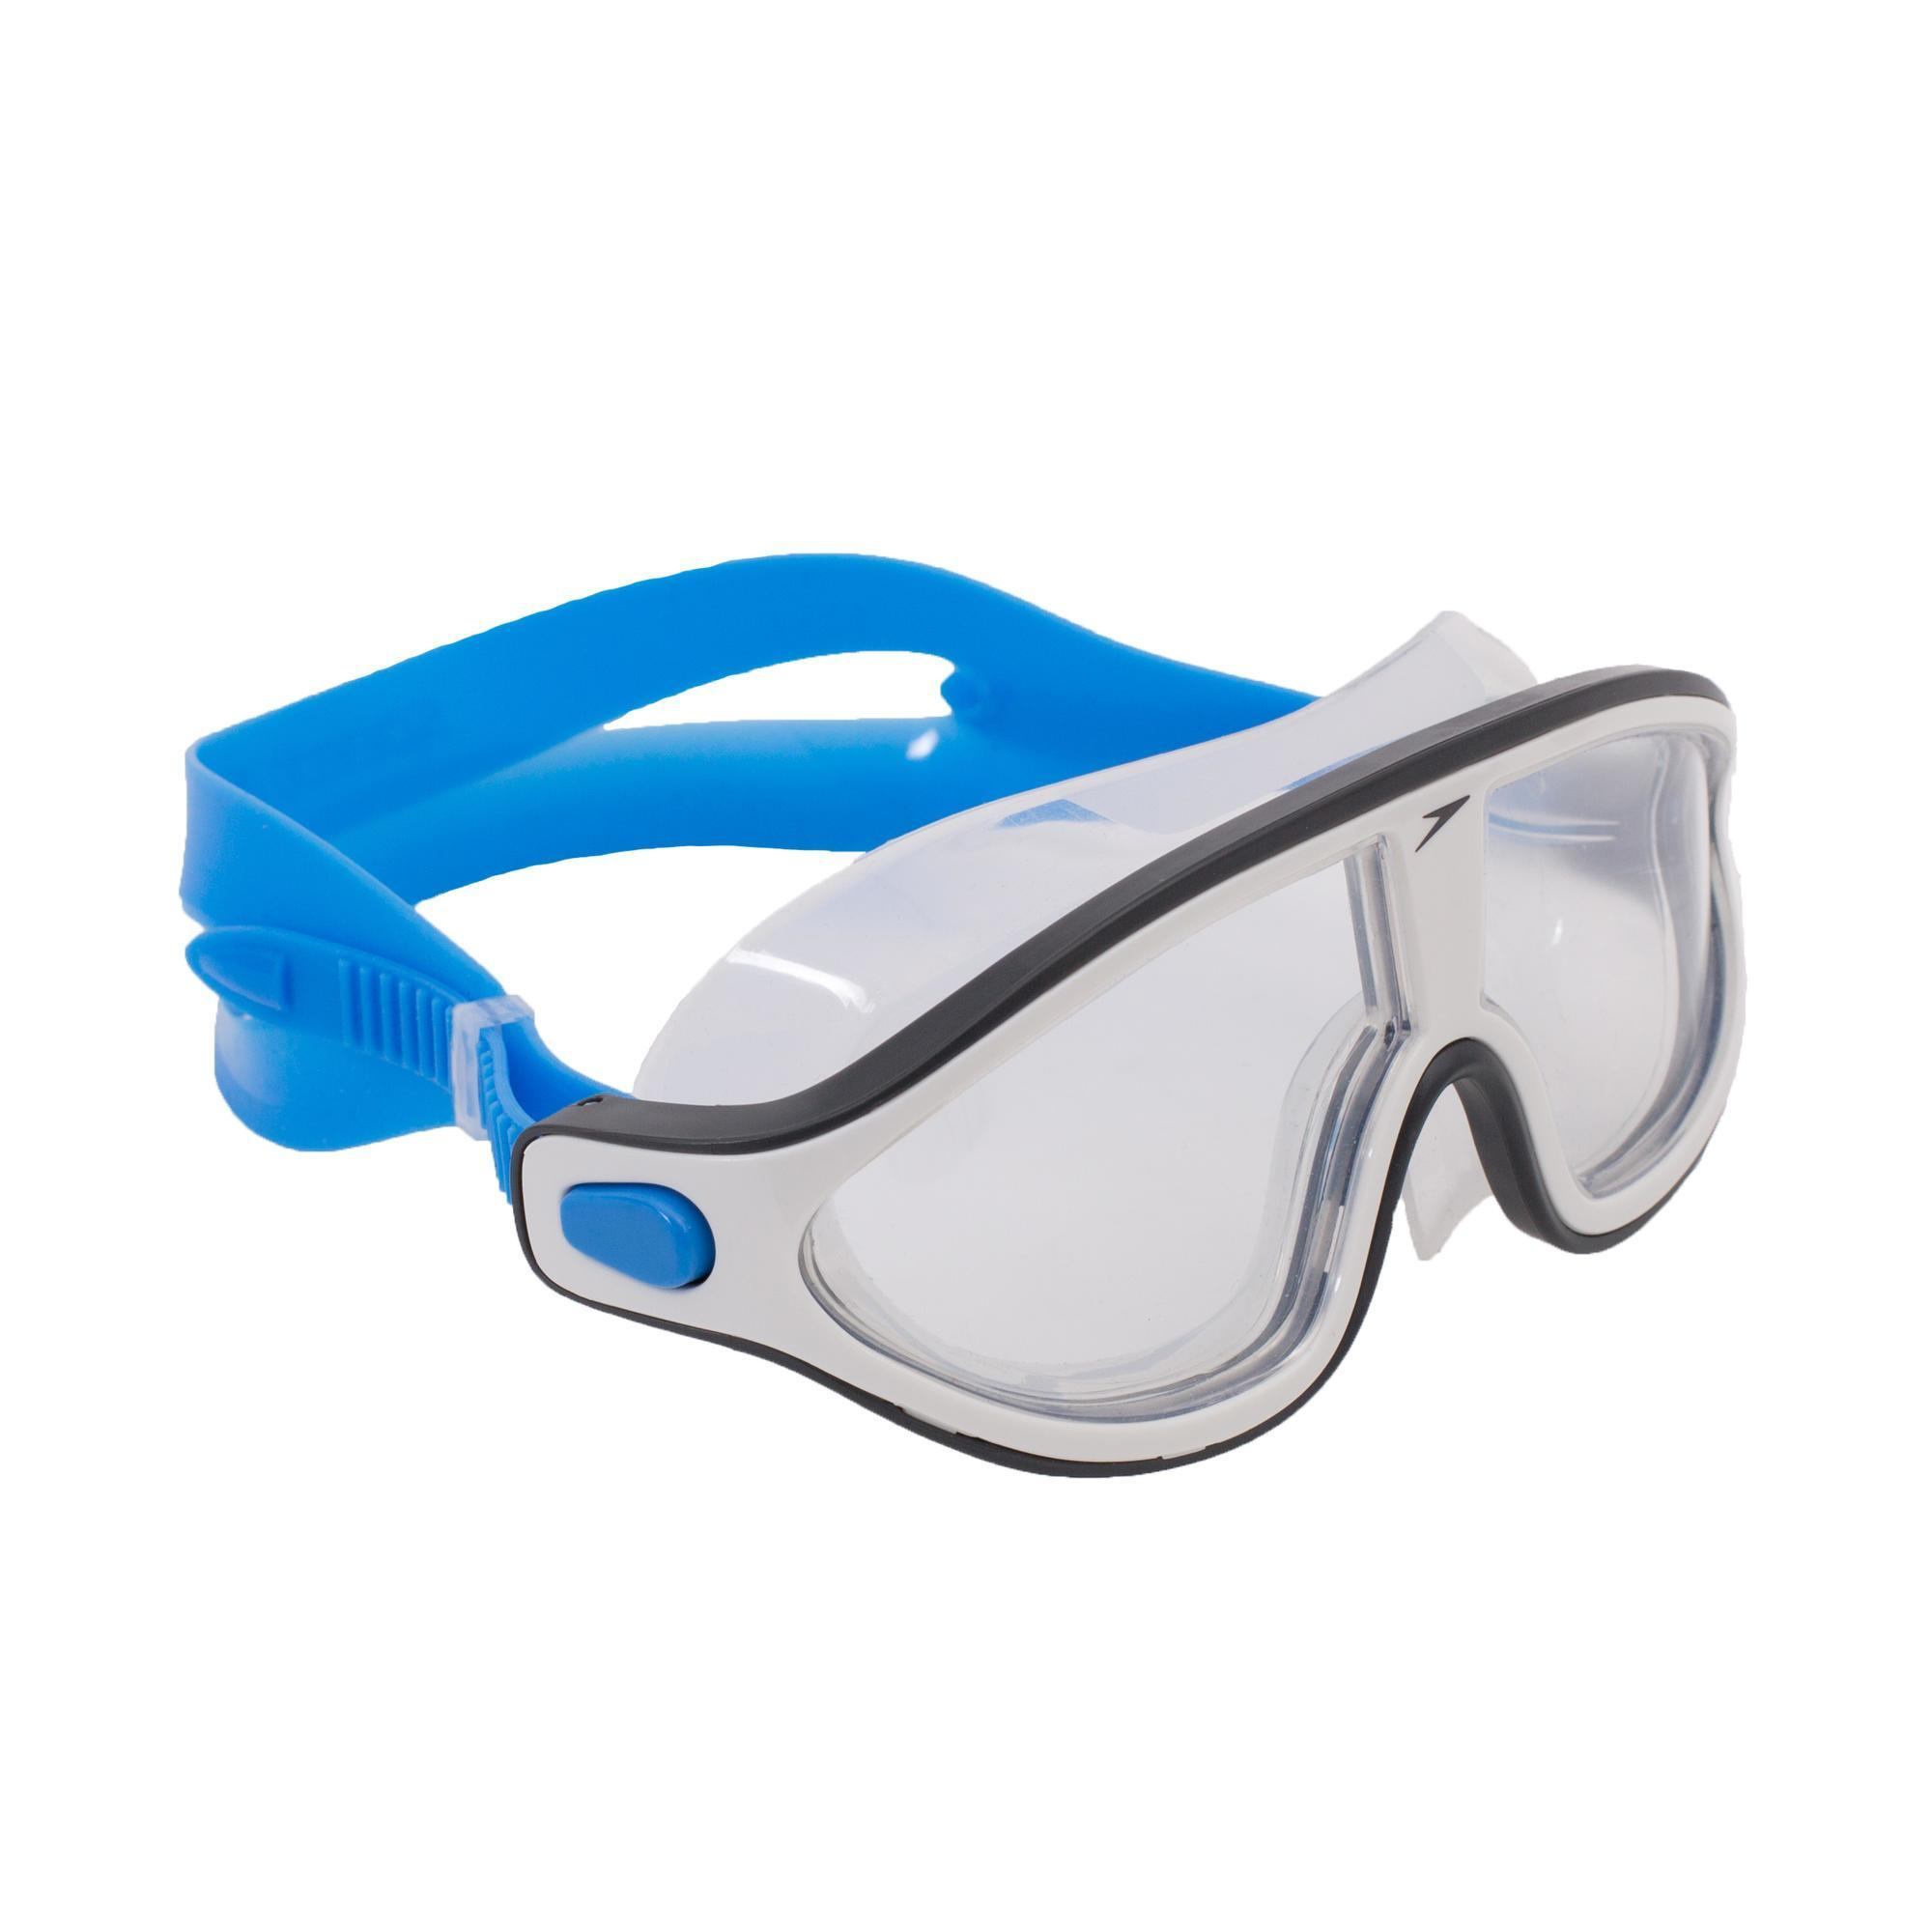 Speedo Zwembril Rift helder maat L blauw wit